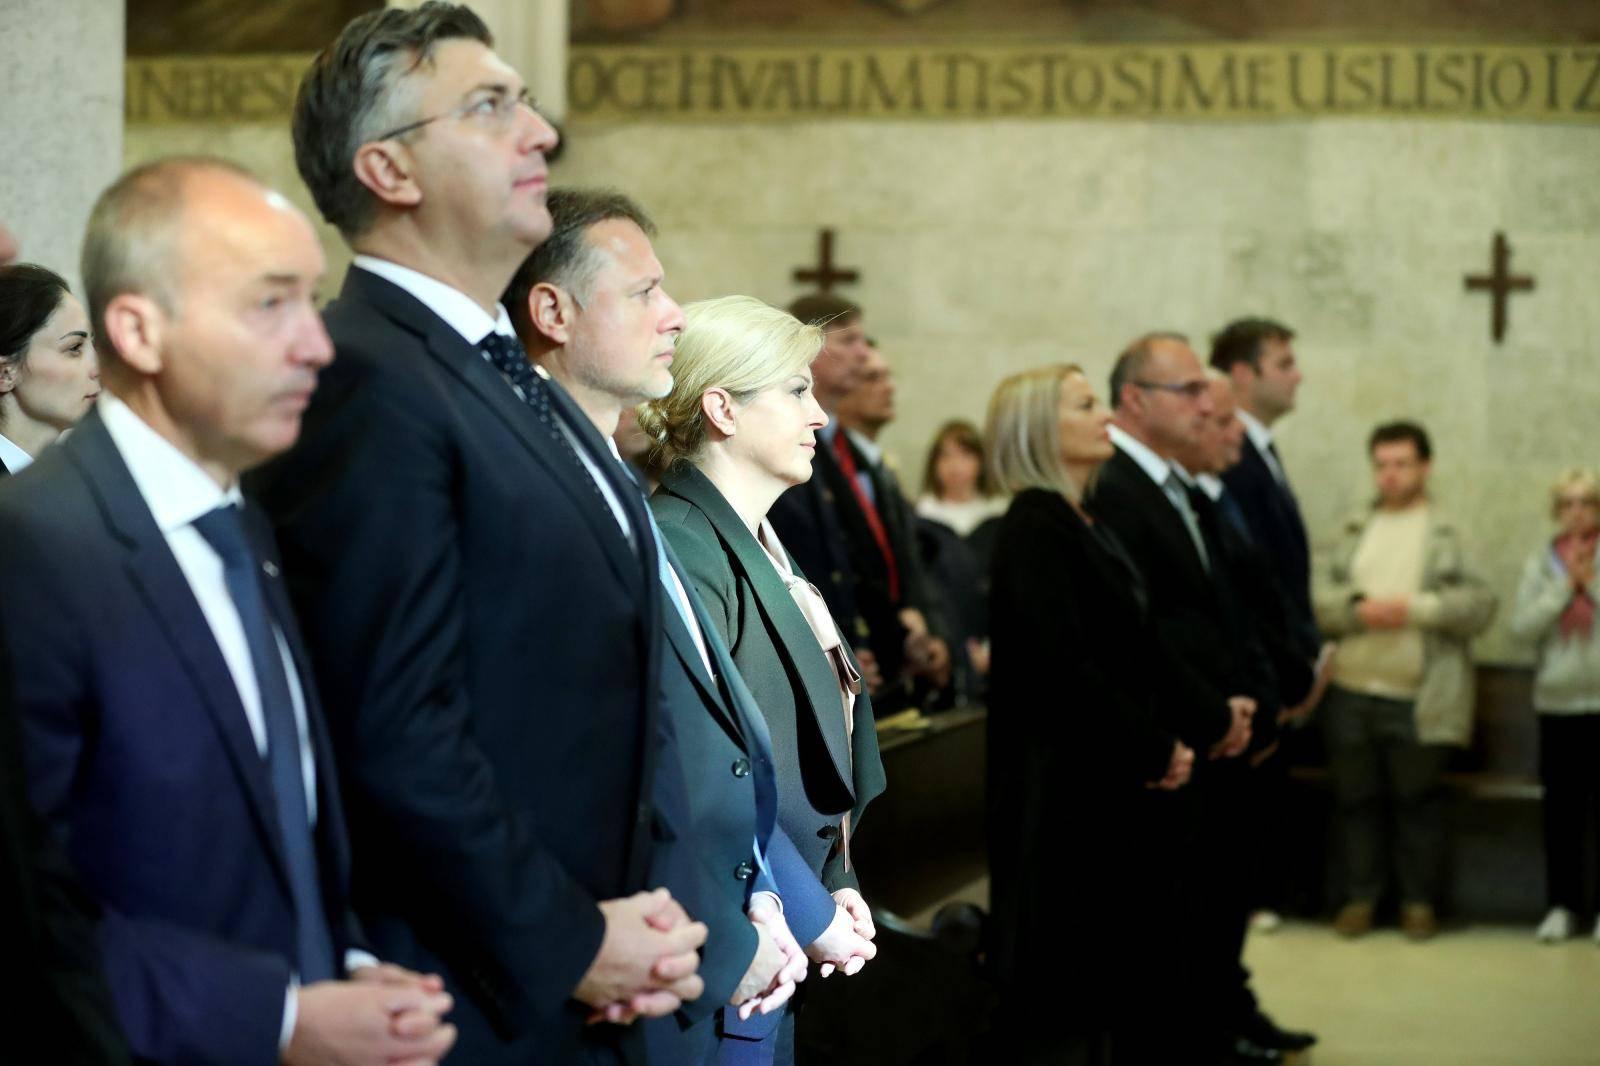 Kolinda pjevala, HNS nije niti došao, premijer na misi šaptao